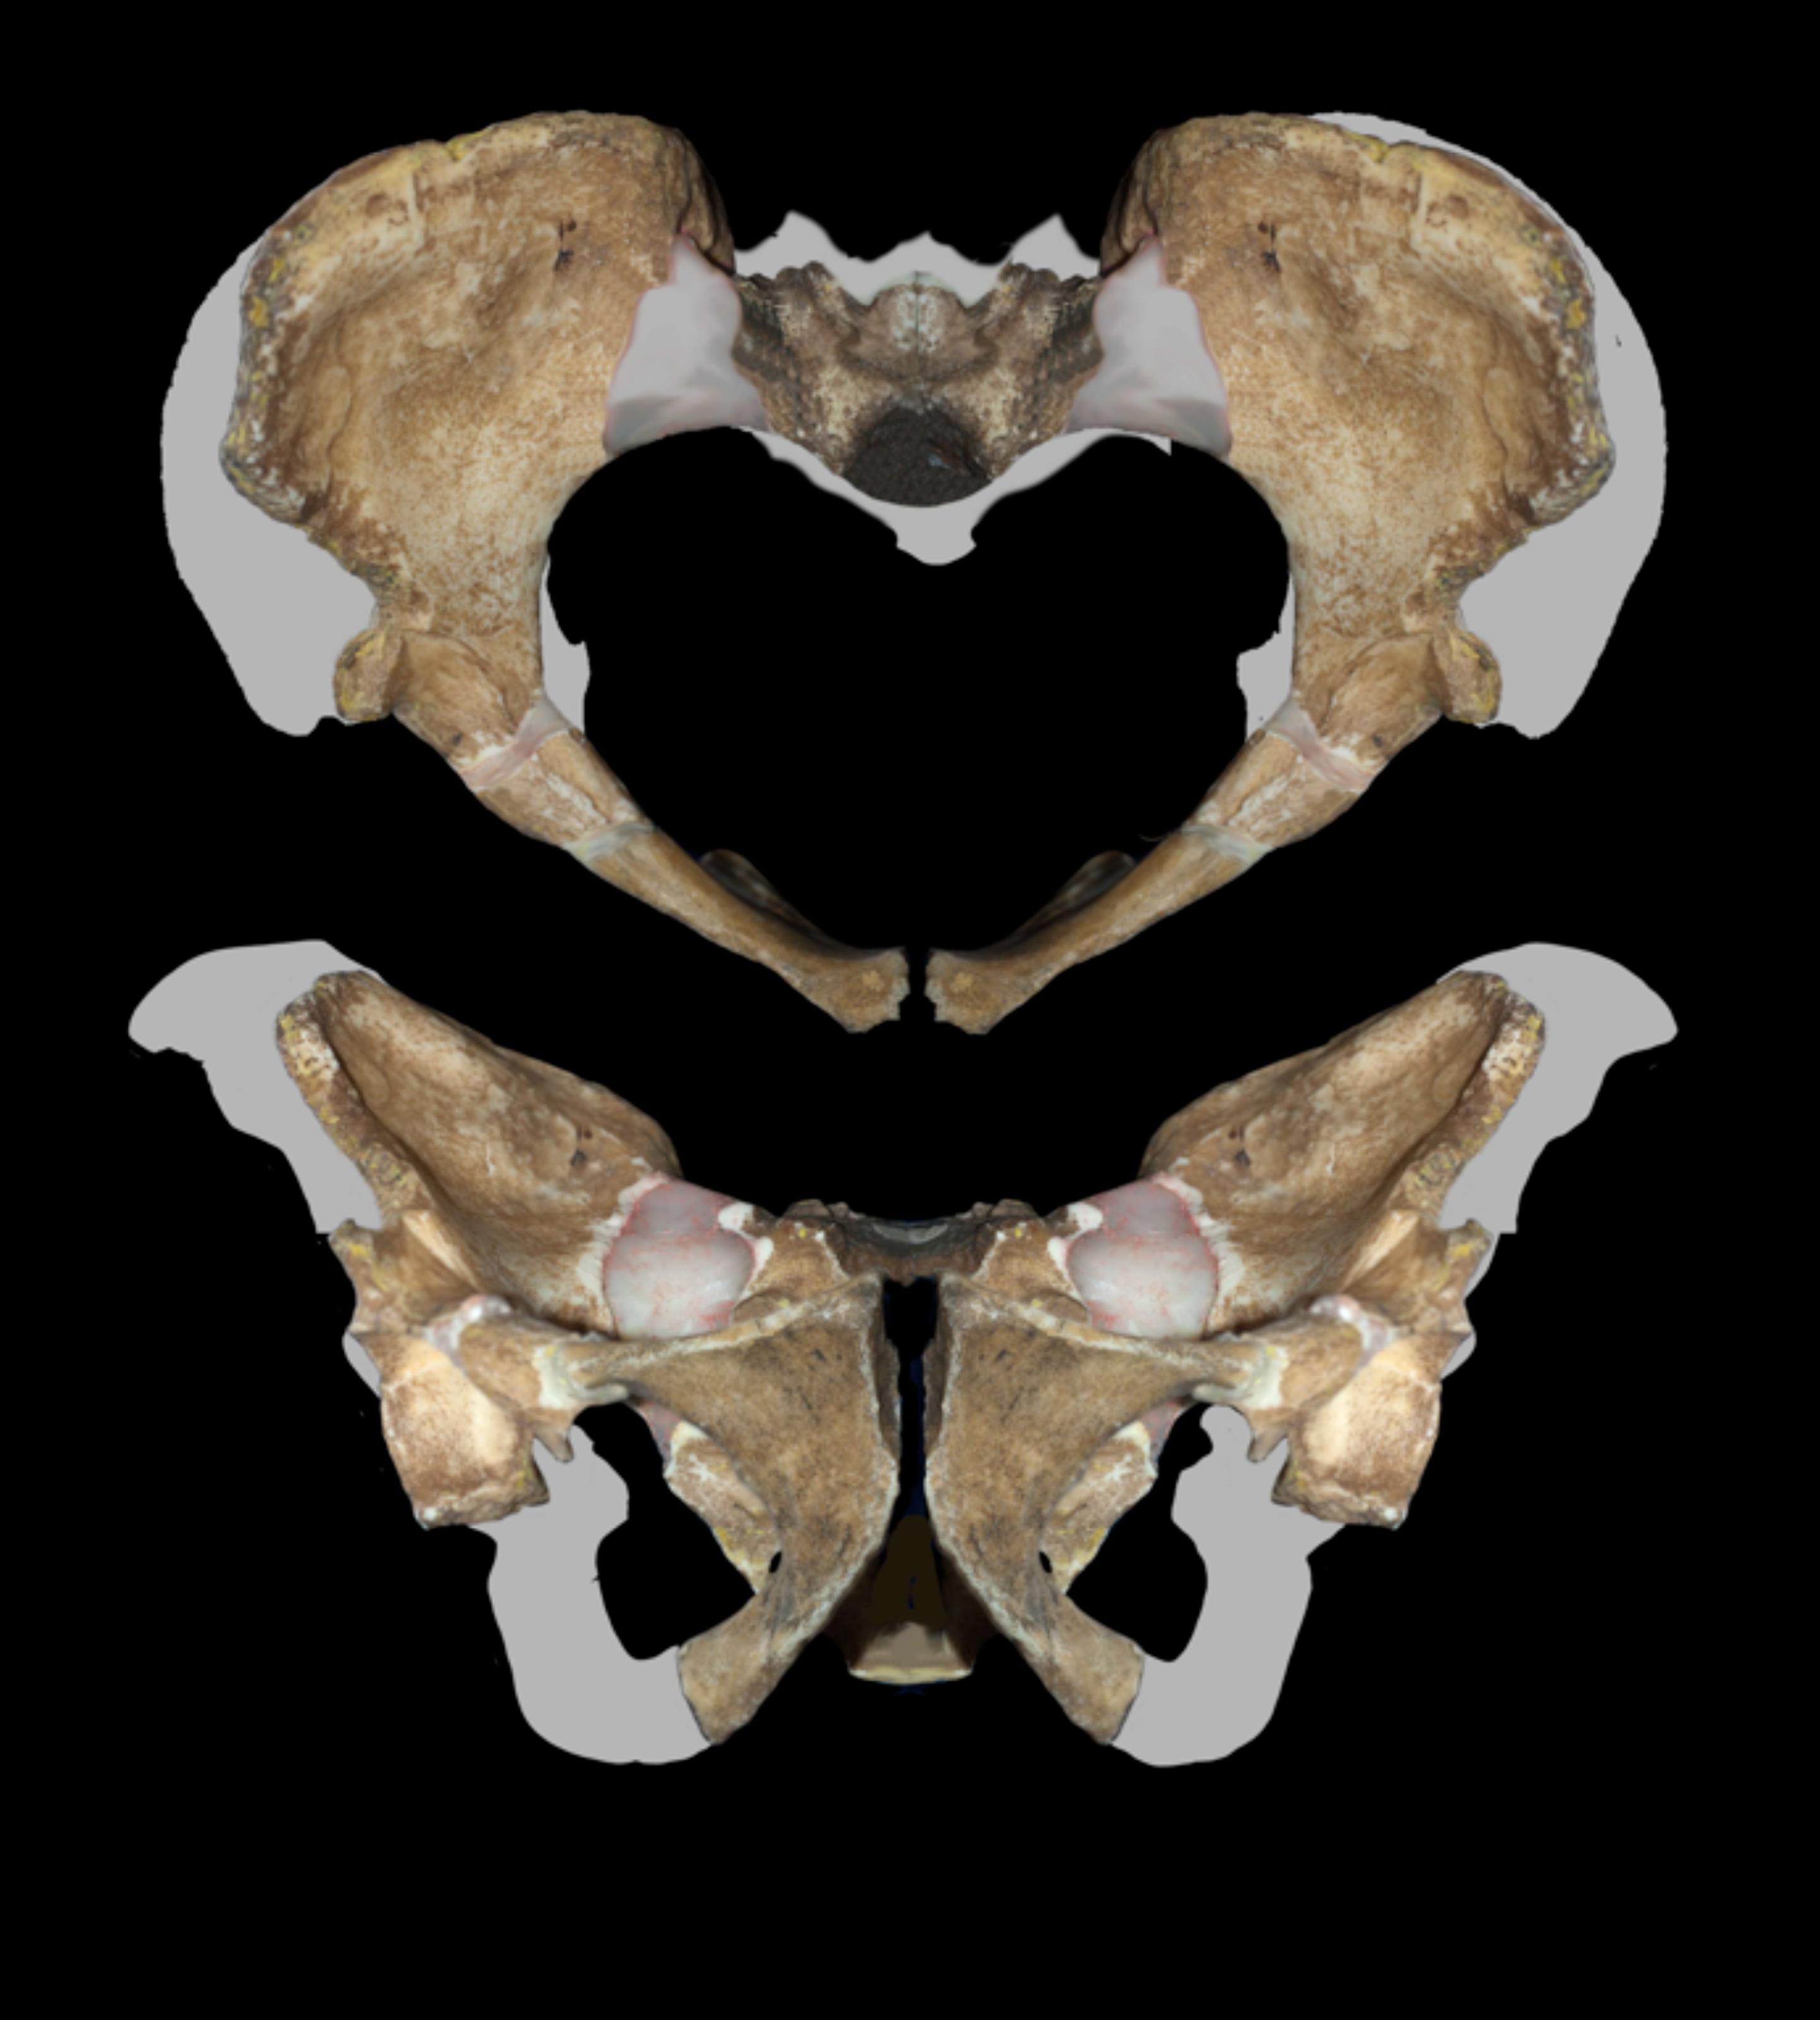 Pelvis de Australopithecus sediba